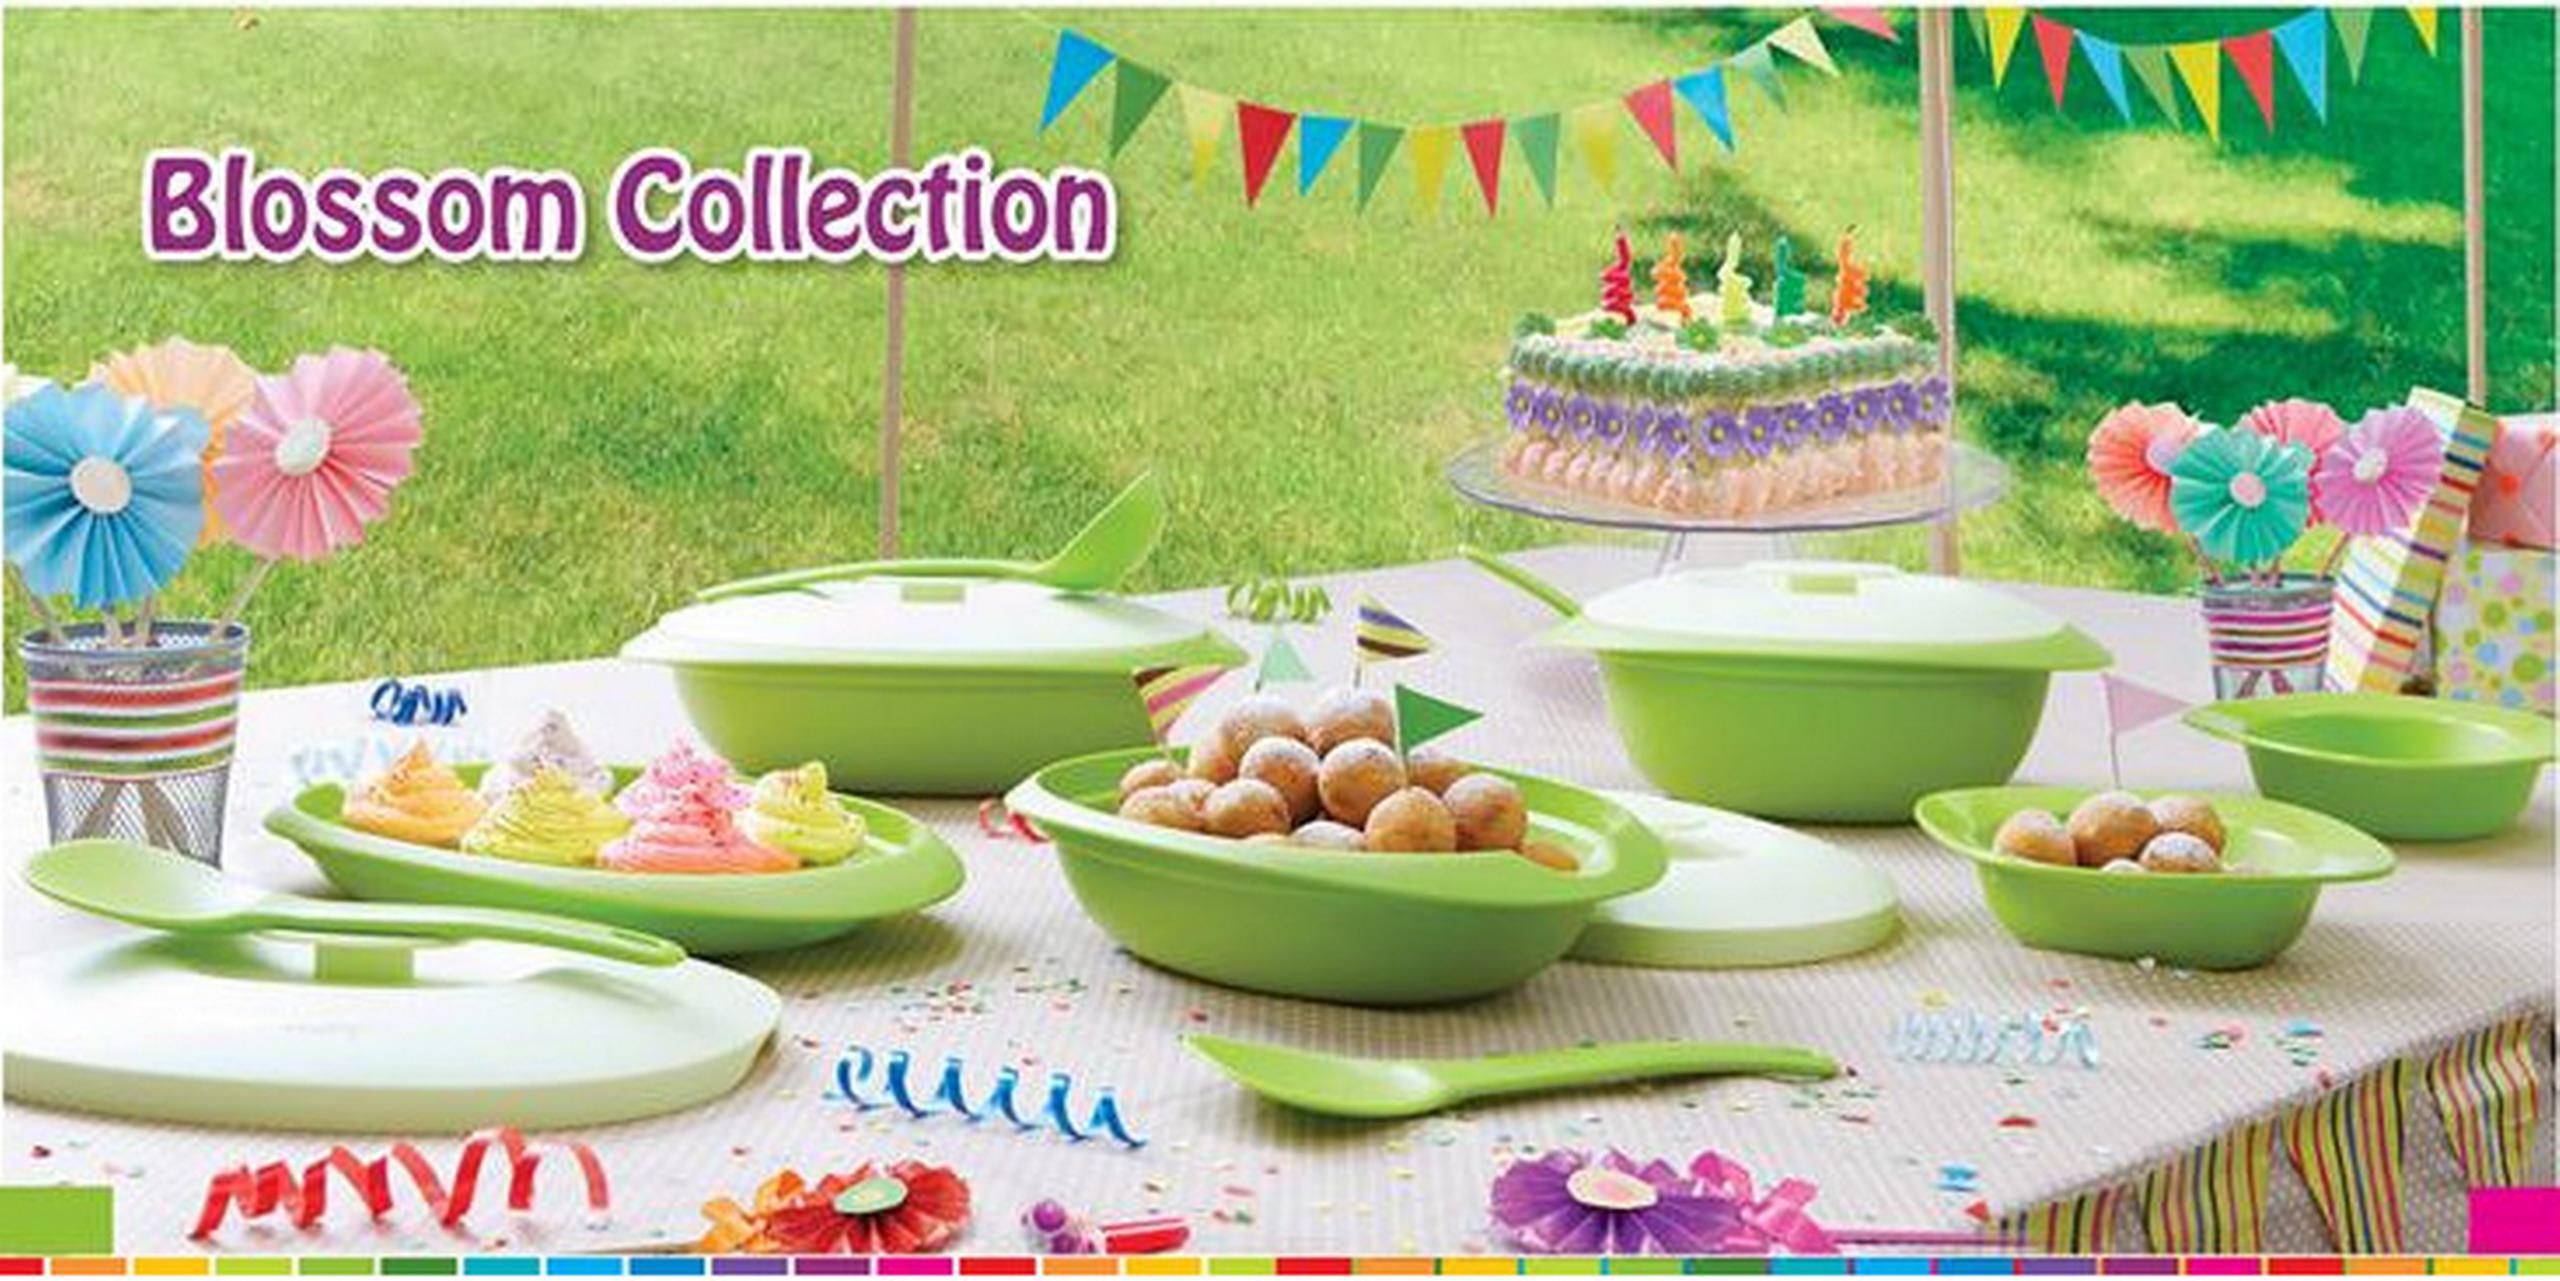 http://freetupperware.files.wordpress.com/2013/08/tupperware-blossom-collection.jpg